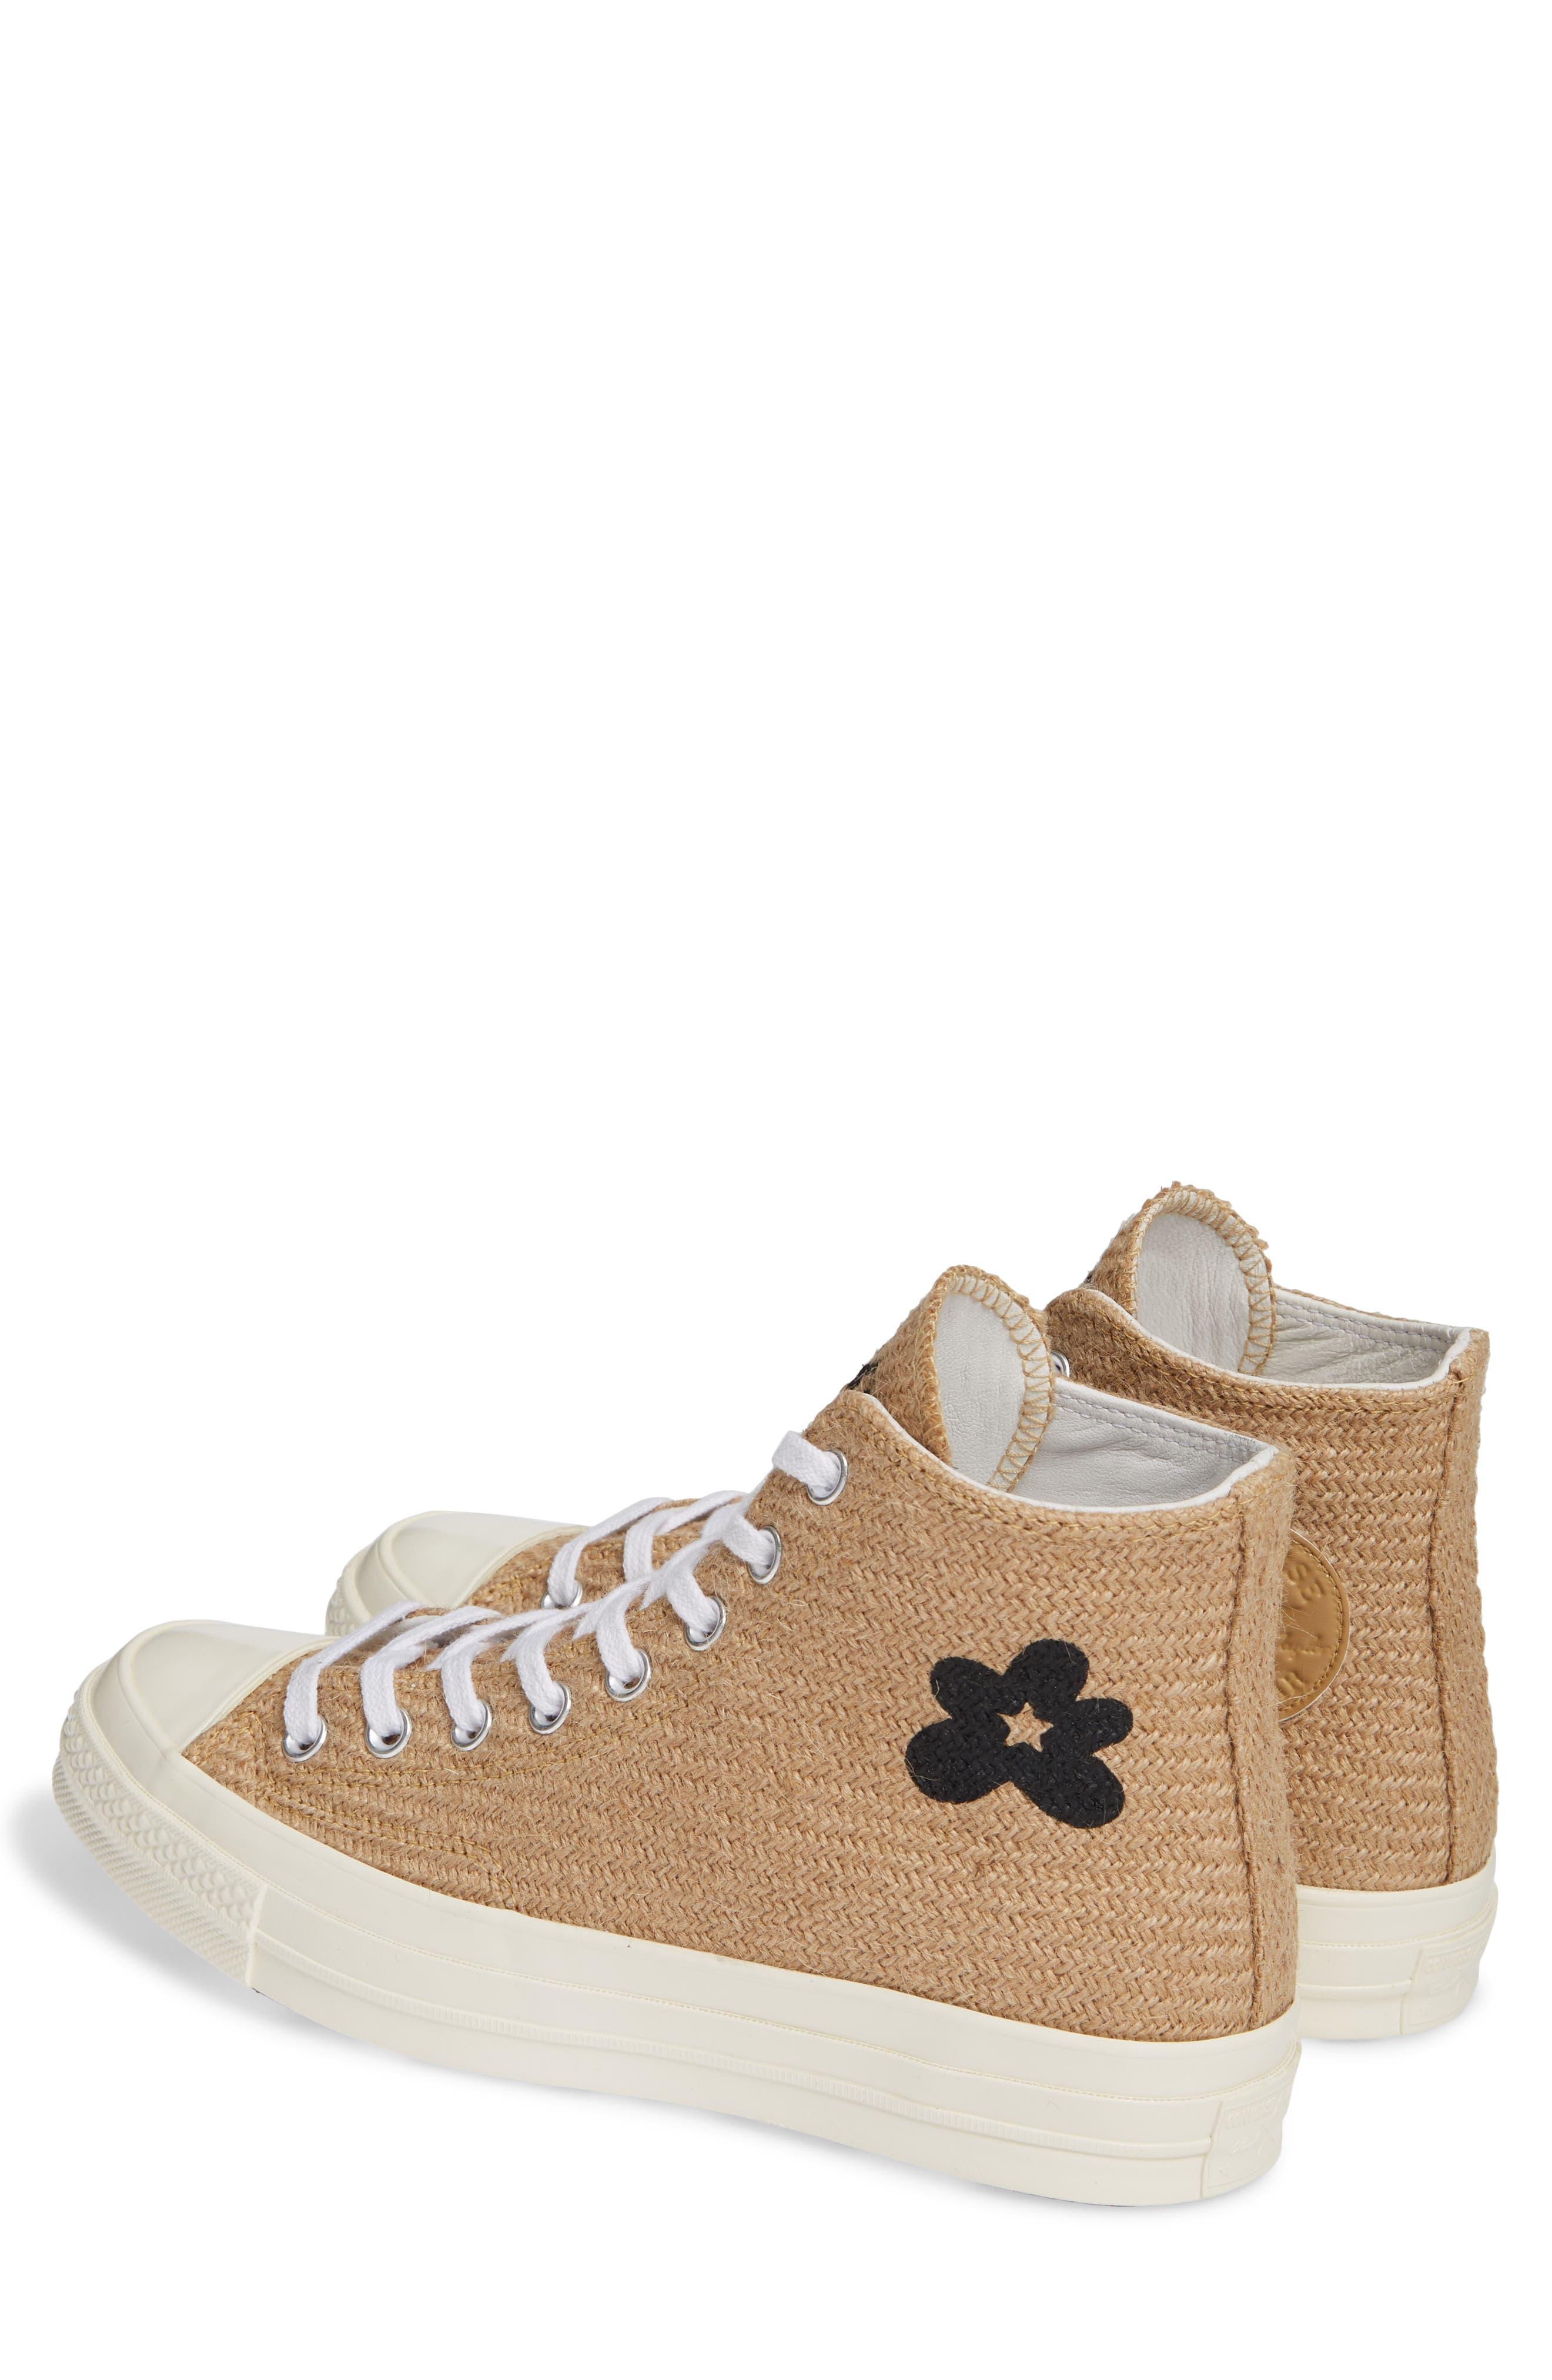 x GOLF le FLEUR* Chuck 70 High Top Sneaker,                             Alternate thumbnail 2, color,                             209